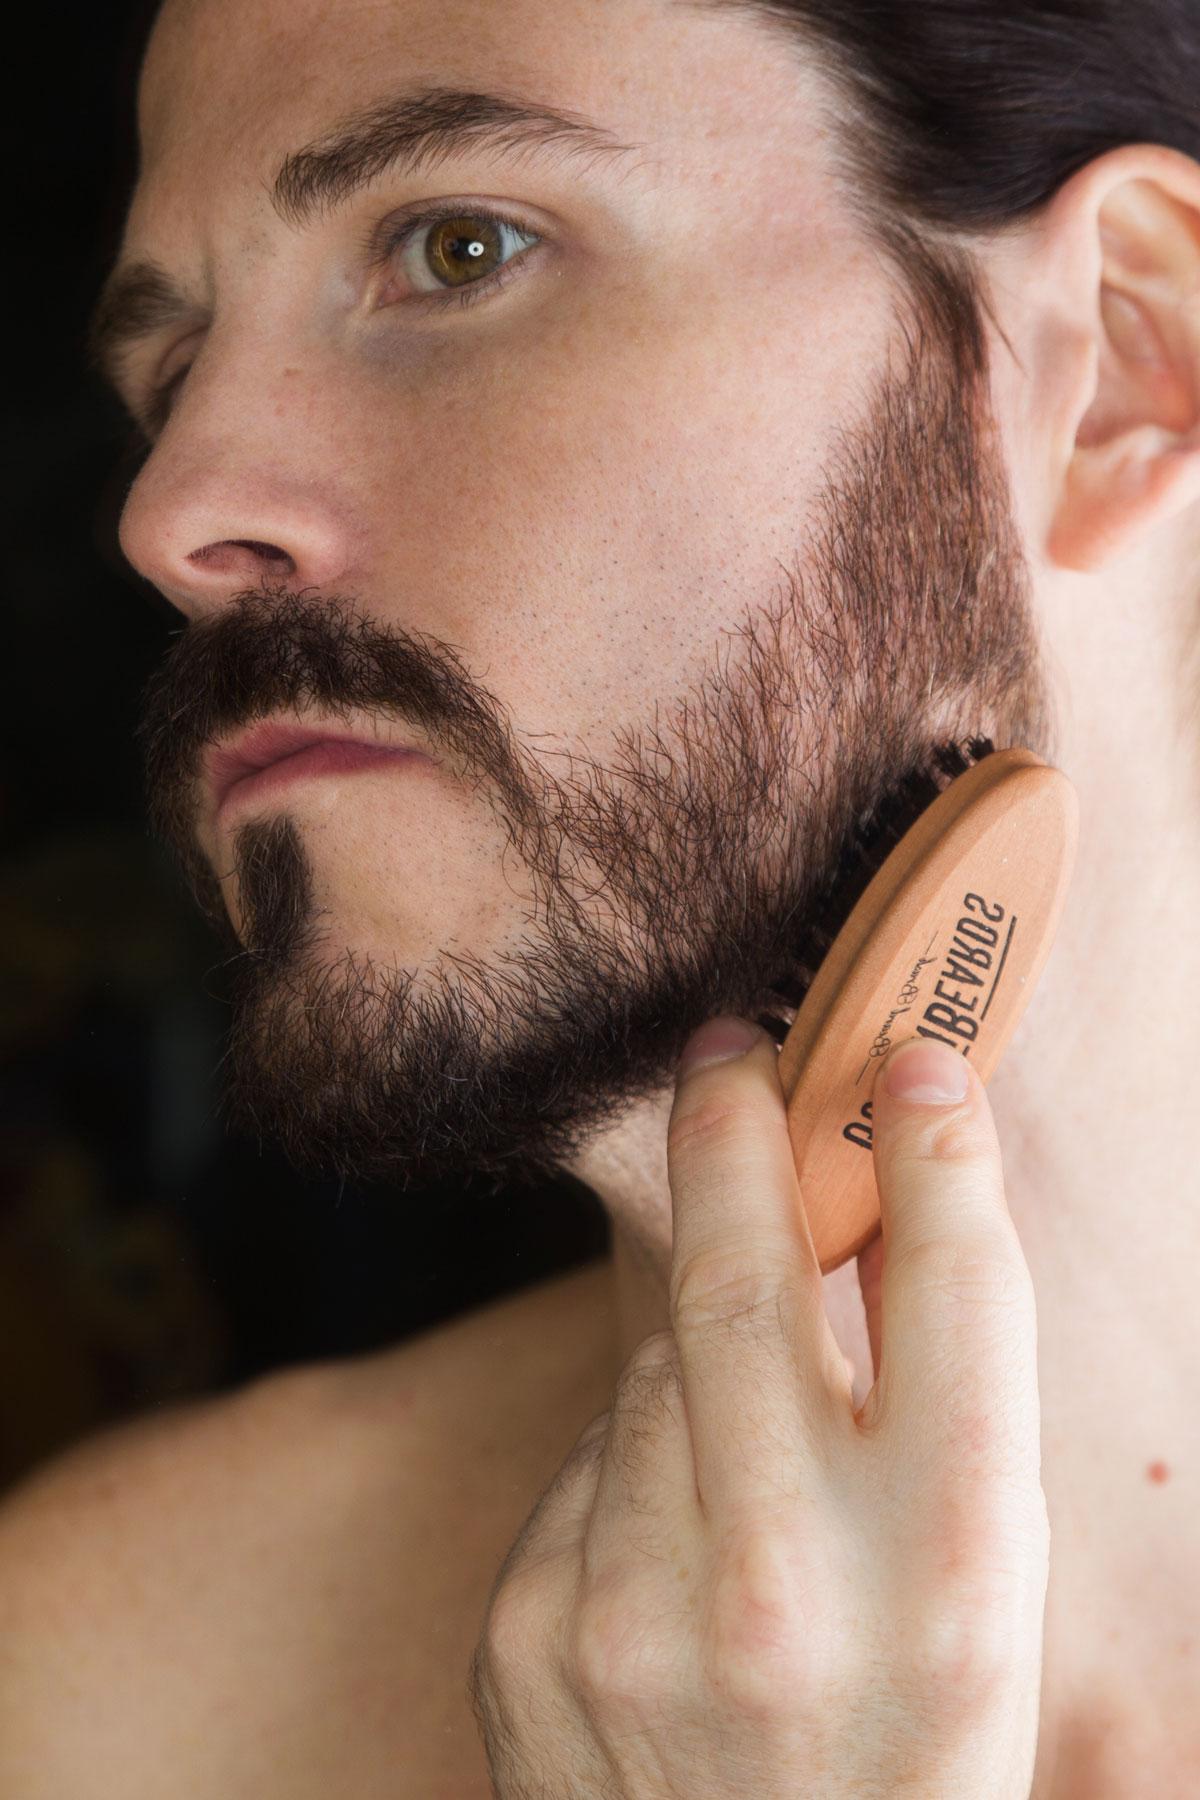 beauty-golden-beards-rasur-bart-bartpflege-bartoel-rasierpinsel